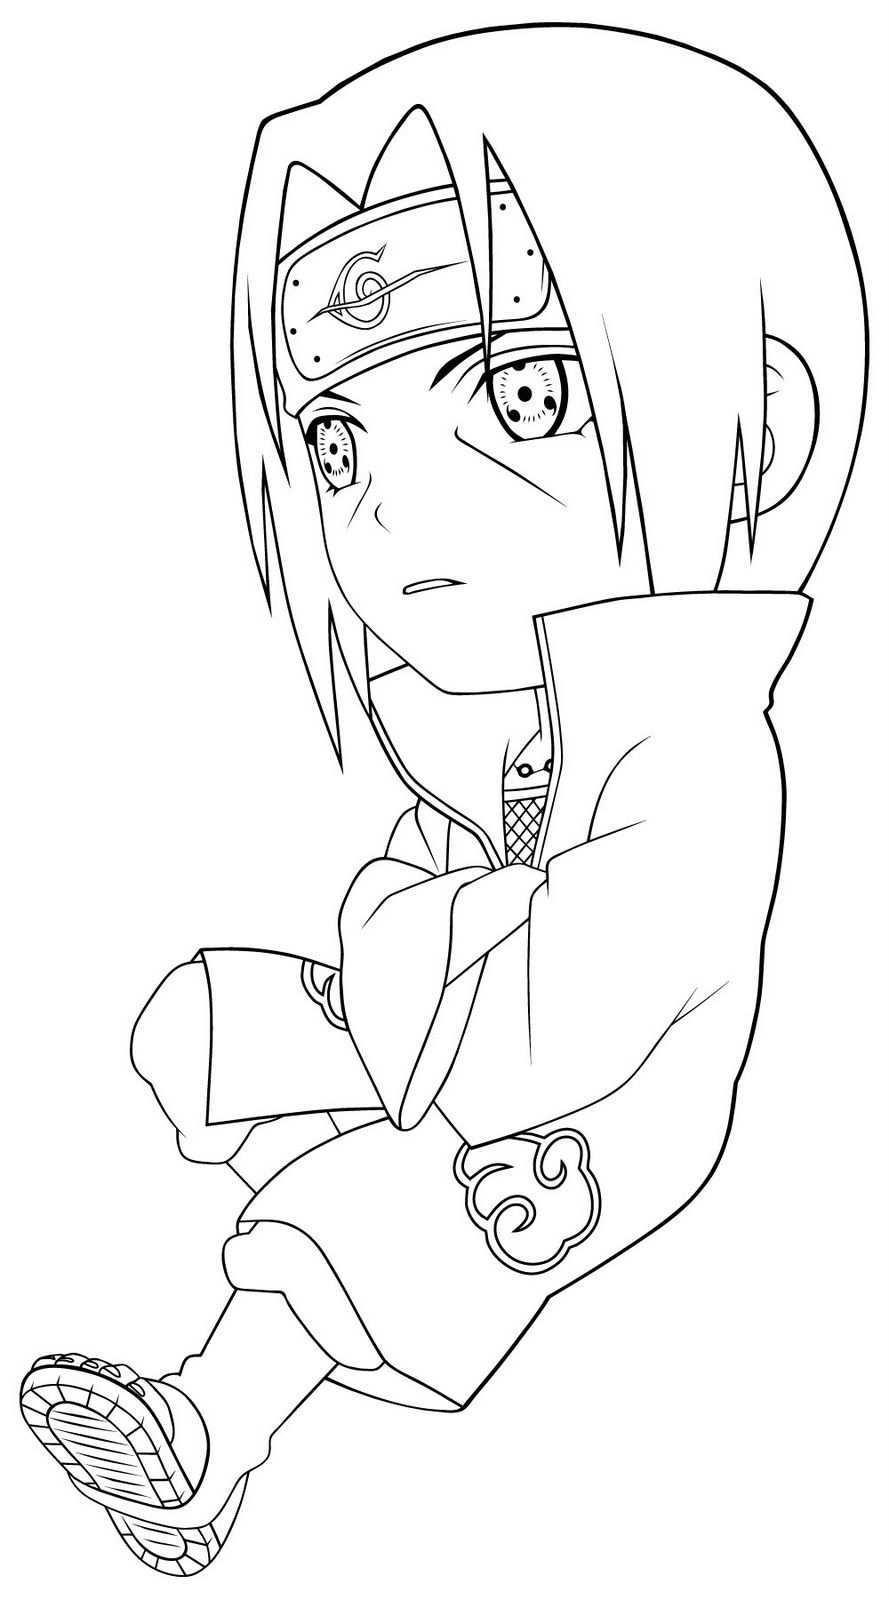 Cool Naruto Sasuke Ausmalbilder Zum Ausdrucken Ausmalbilderring Com Naruto Drawings Ausmalbilder Ausmalen